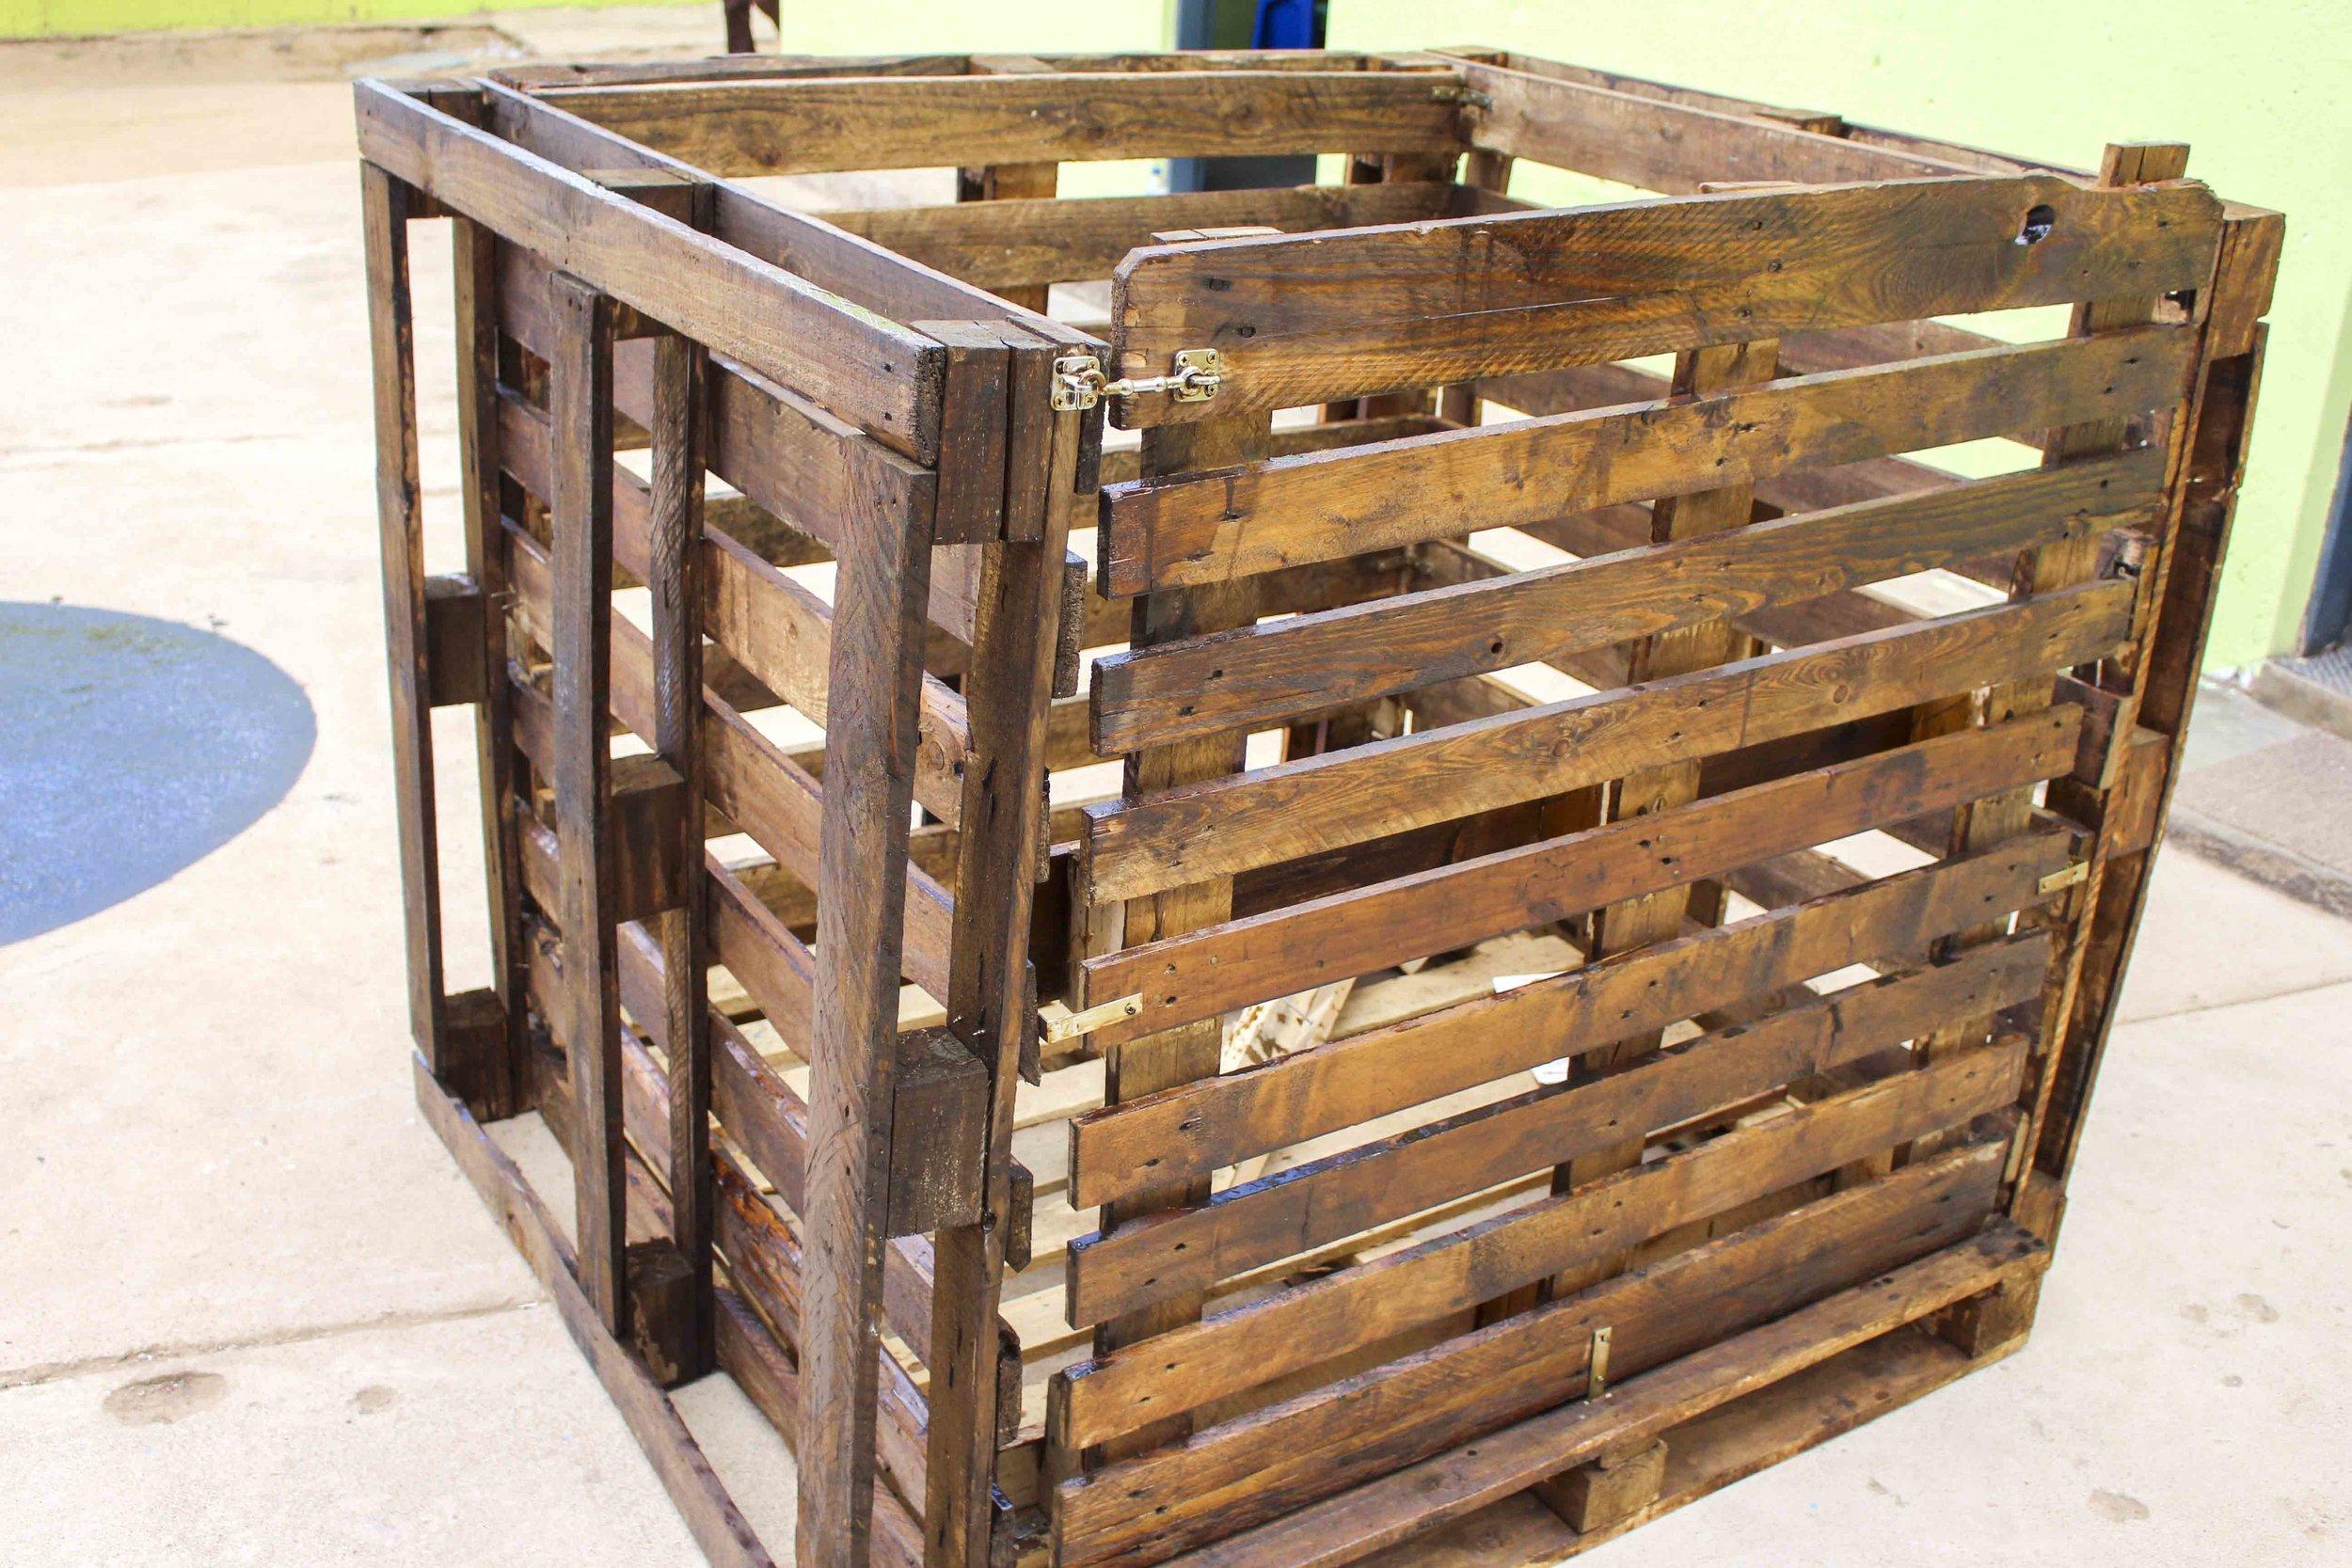 Building compost bins